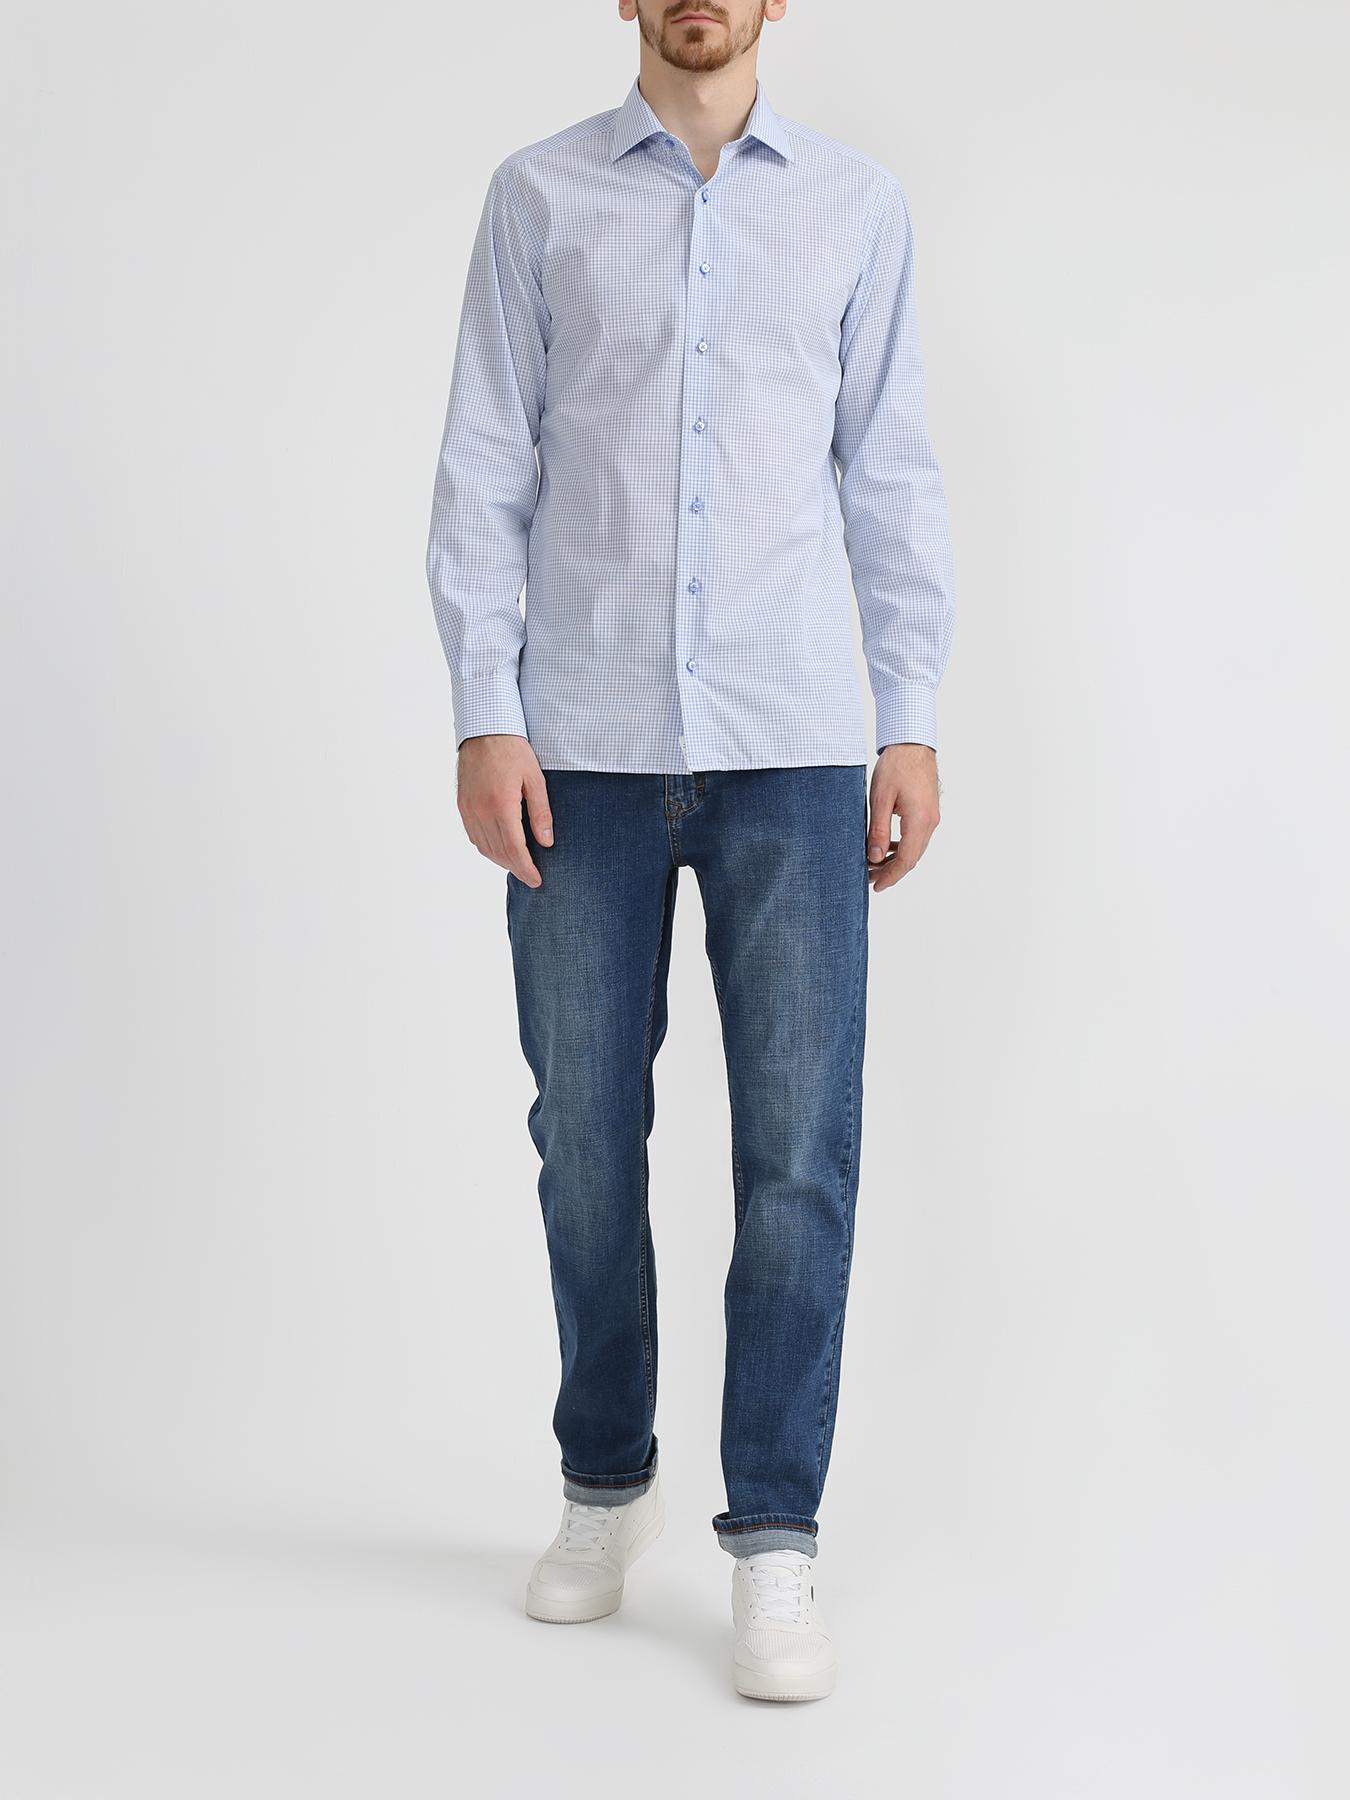 Alessandro Manzoni Мужские джинсы фото